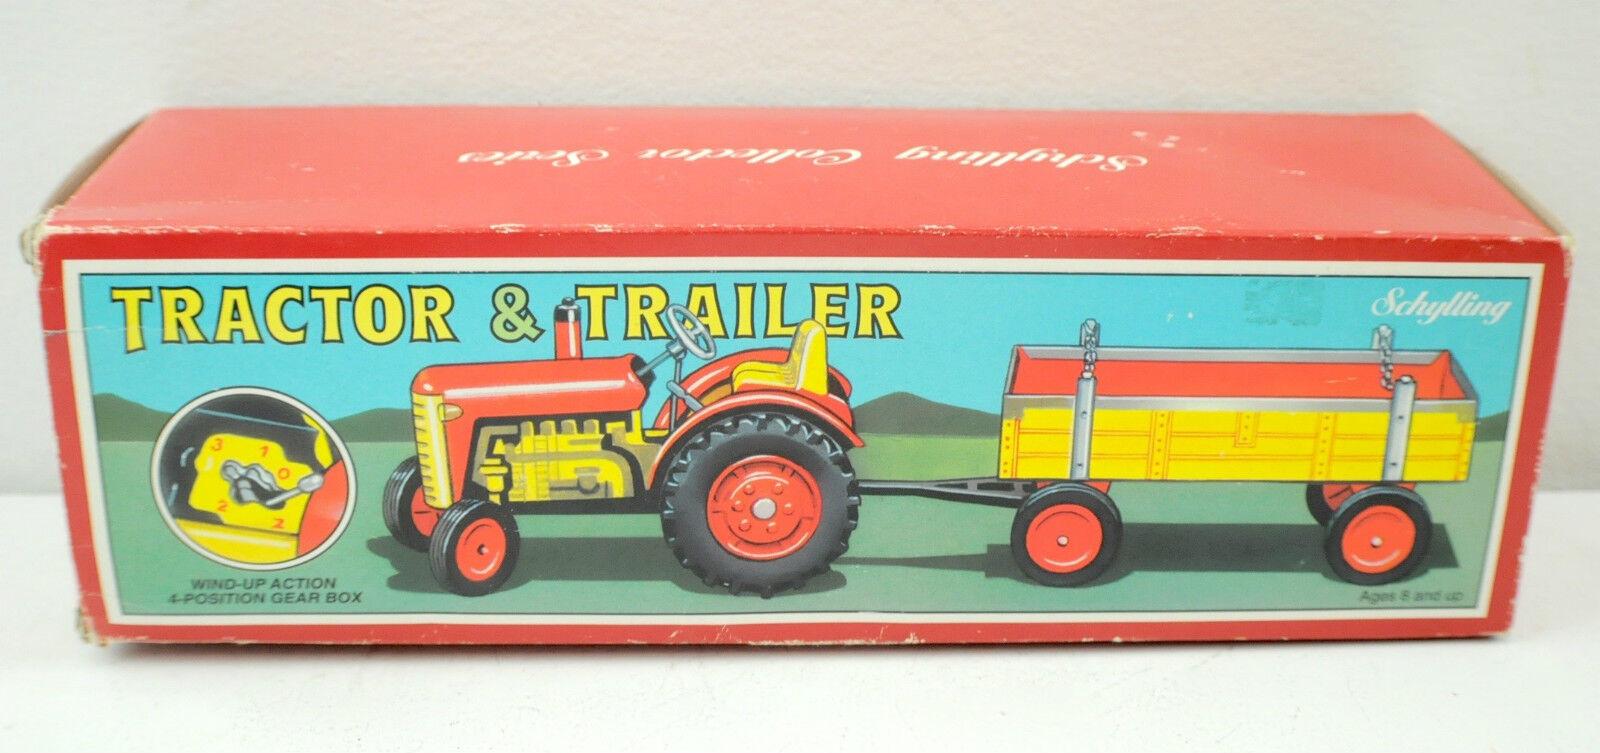 Vintage Schylling Tractor & Trailer